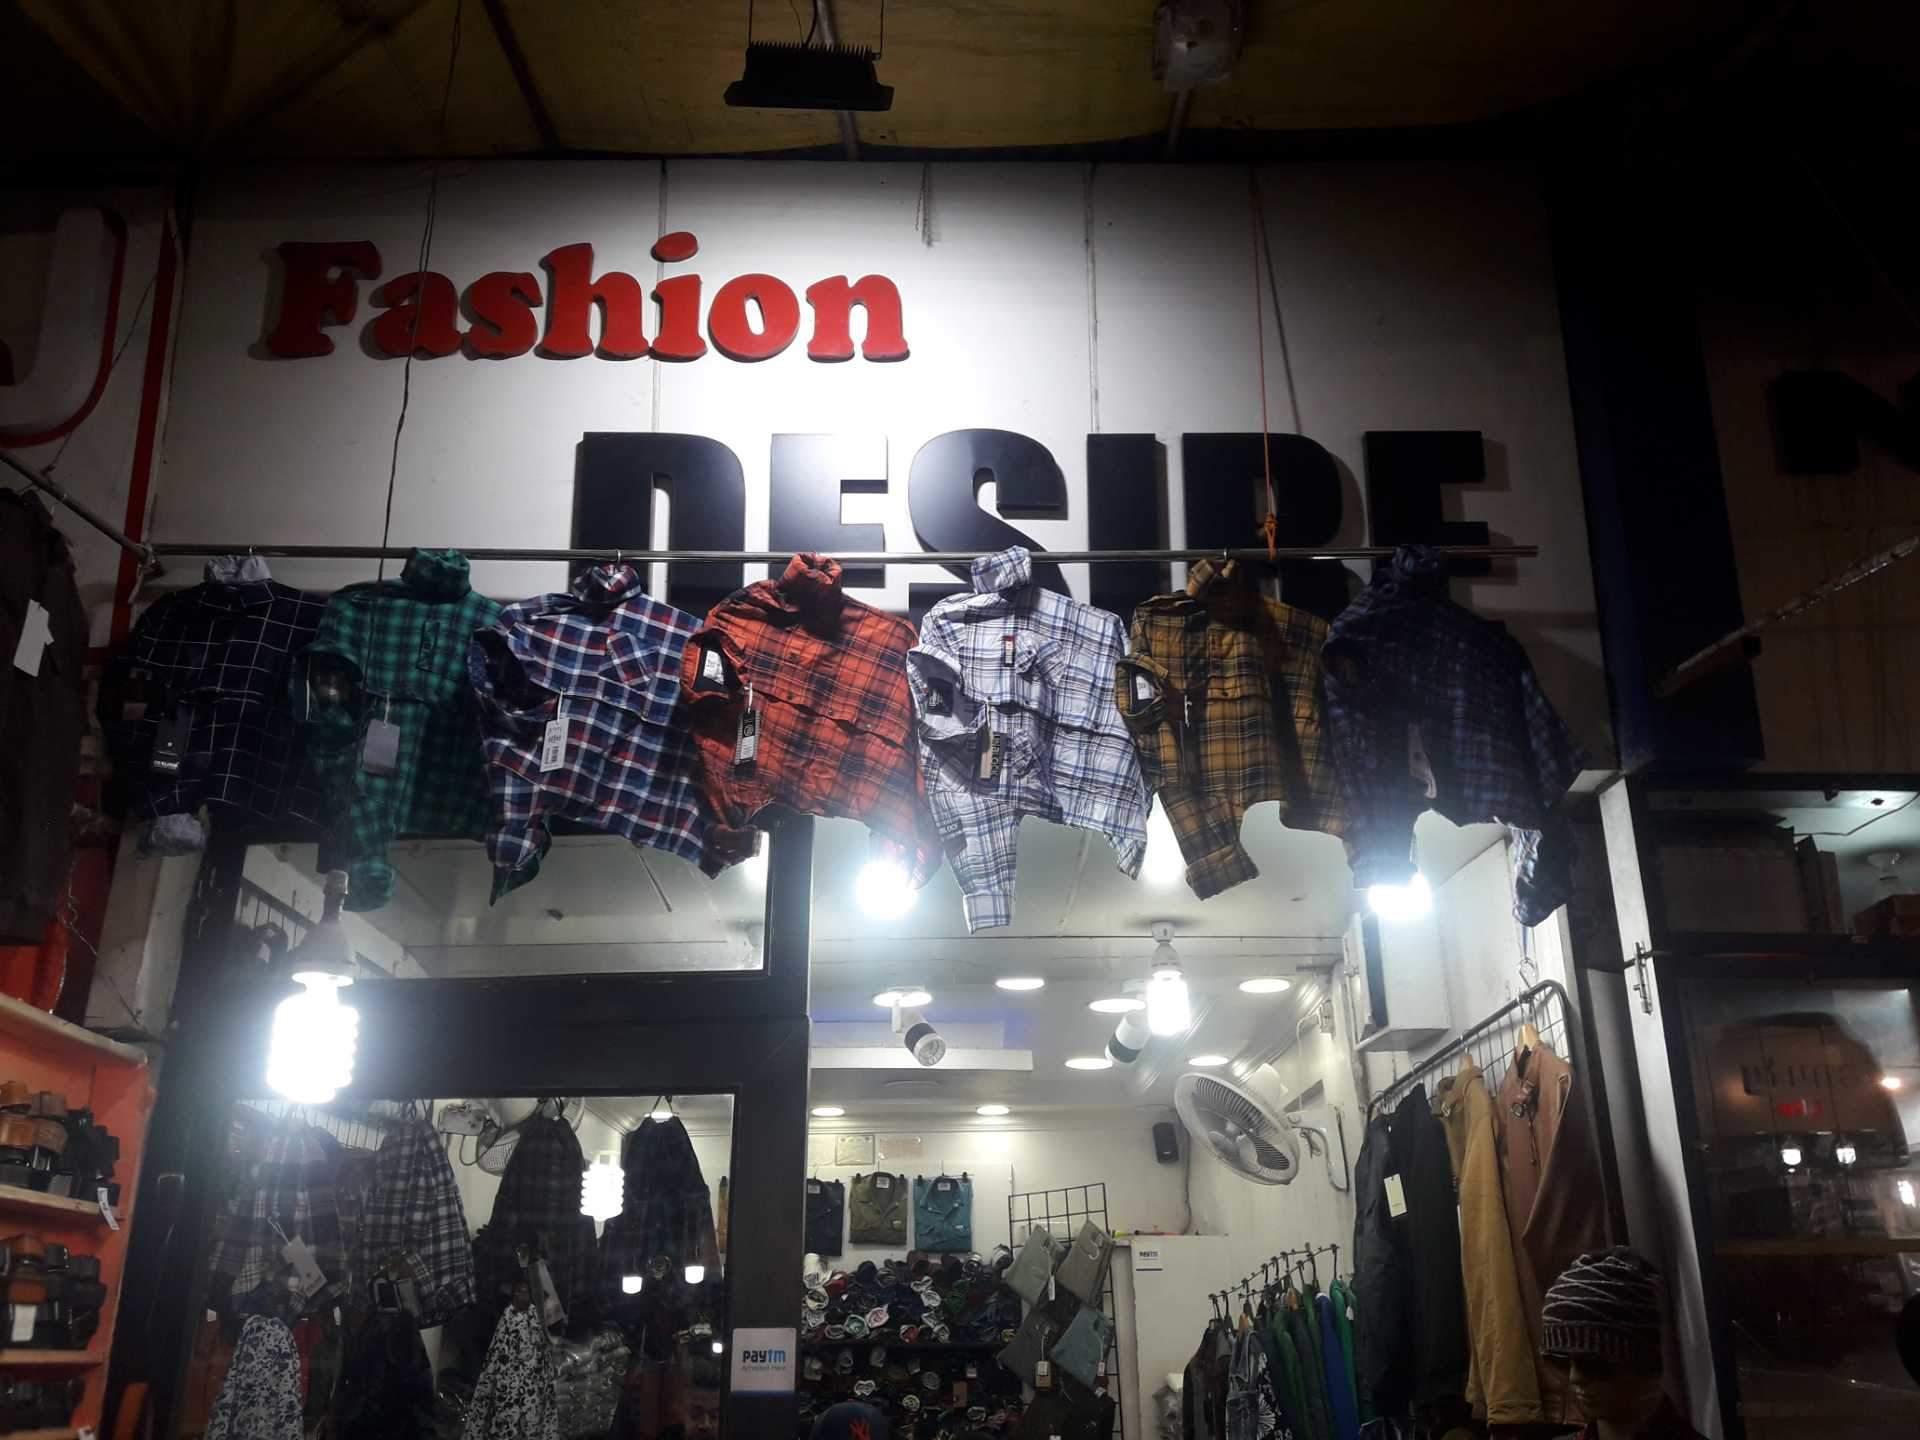 f3dc30f60b8 Top 100 Emporio Armani Gents Readymade Garment Retailers in Bhopal - Best  Emporio Armani Gents Readymade Garment Retailers - Justdial